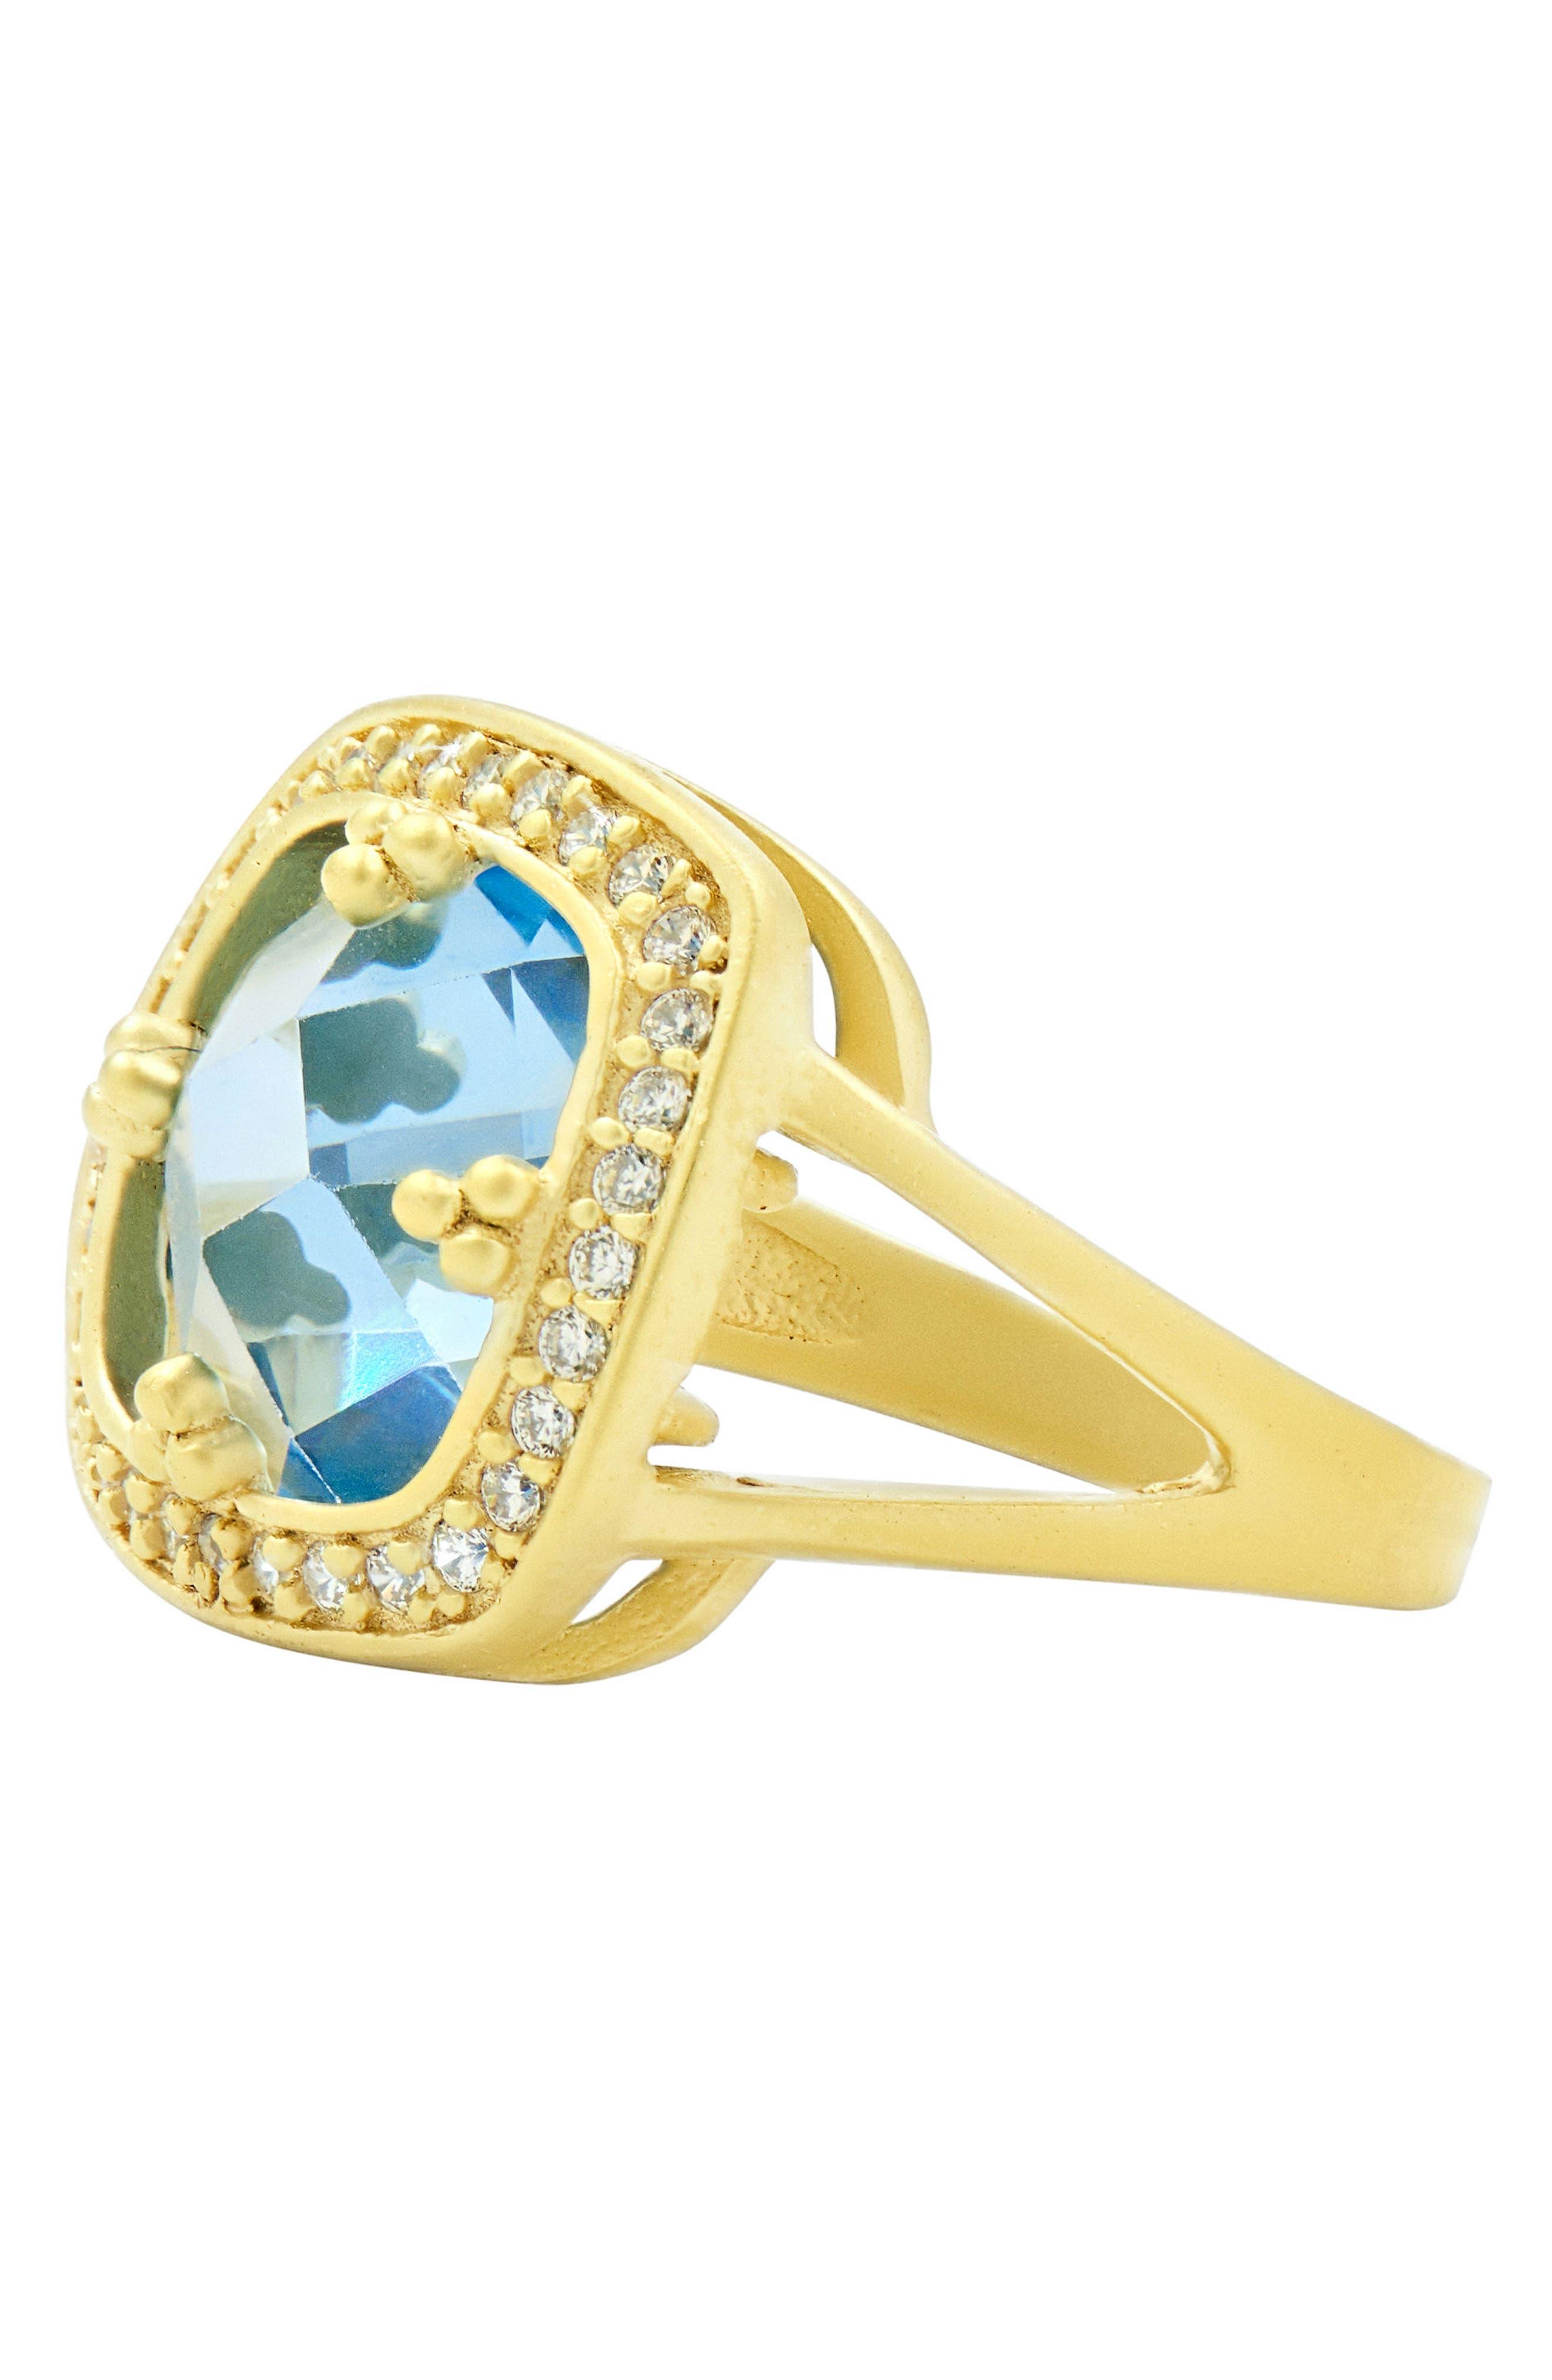 Ocean Azure Cubic Zirconia Ring,                             Alternate thumbnail 2, color,                             GOLD/ AQUA